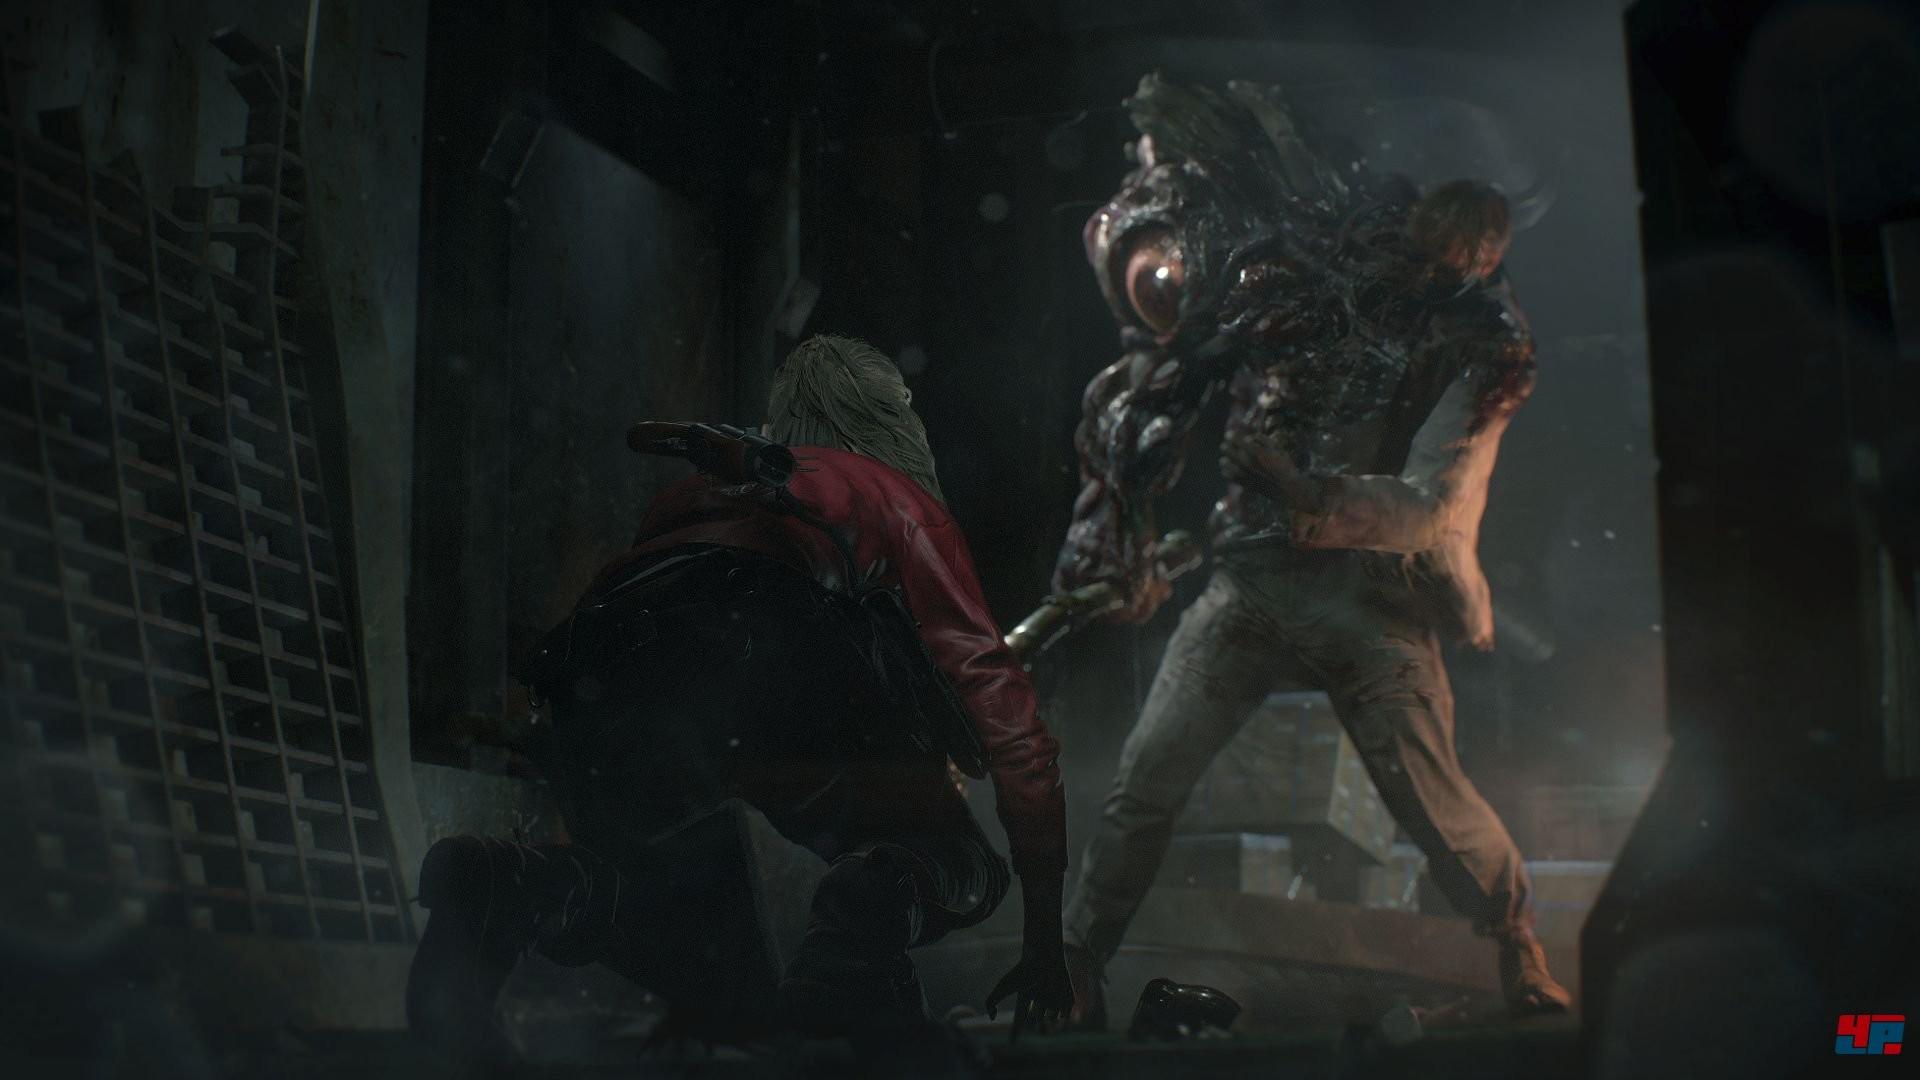 Res: 1920x1080, Screenshot - Resident Evil 2 (PC)